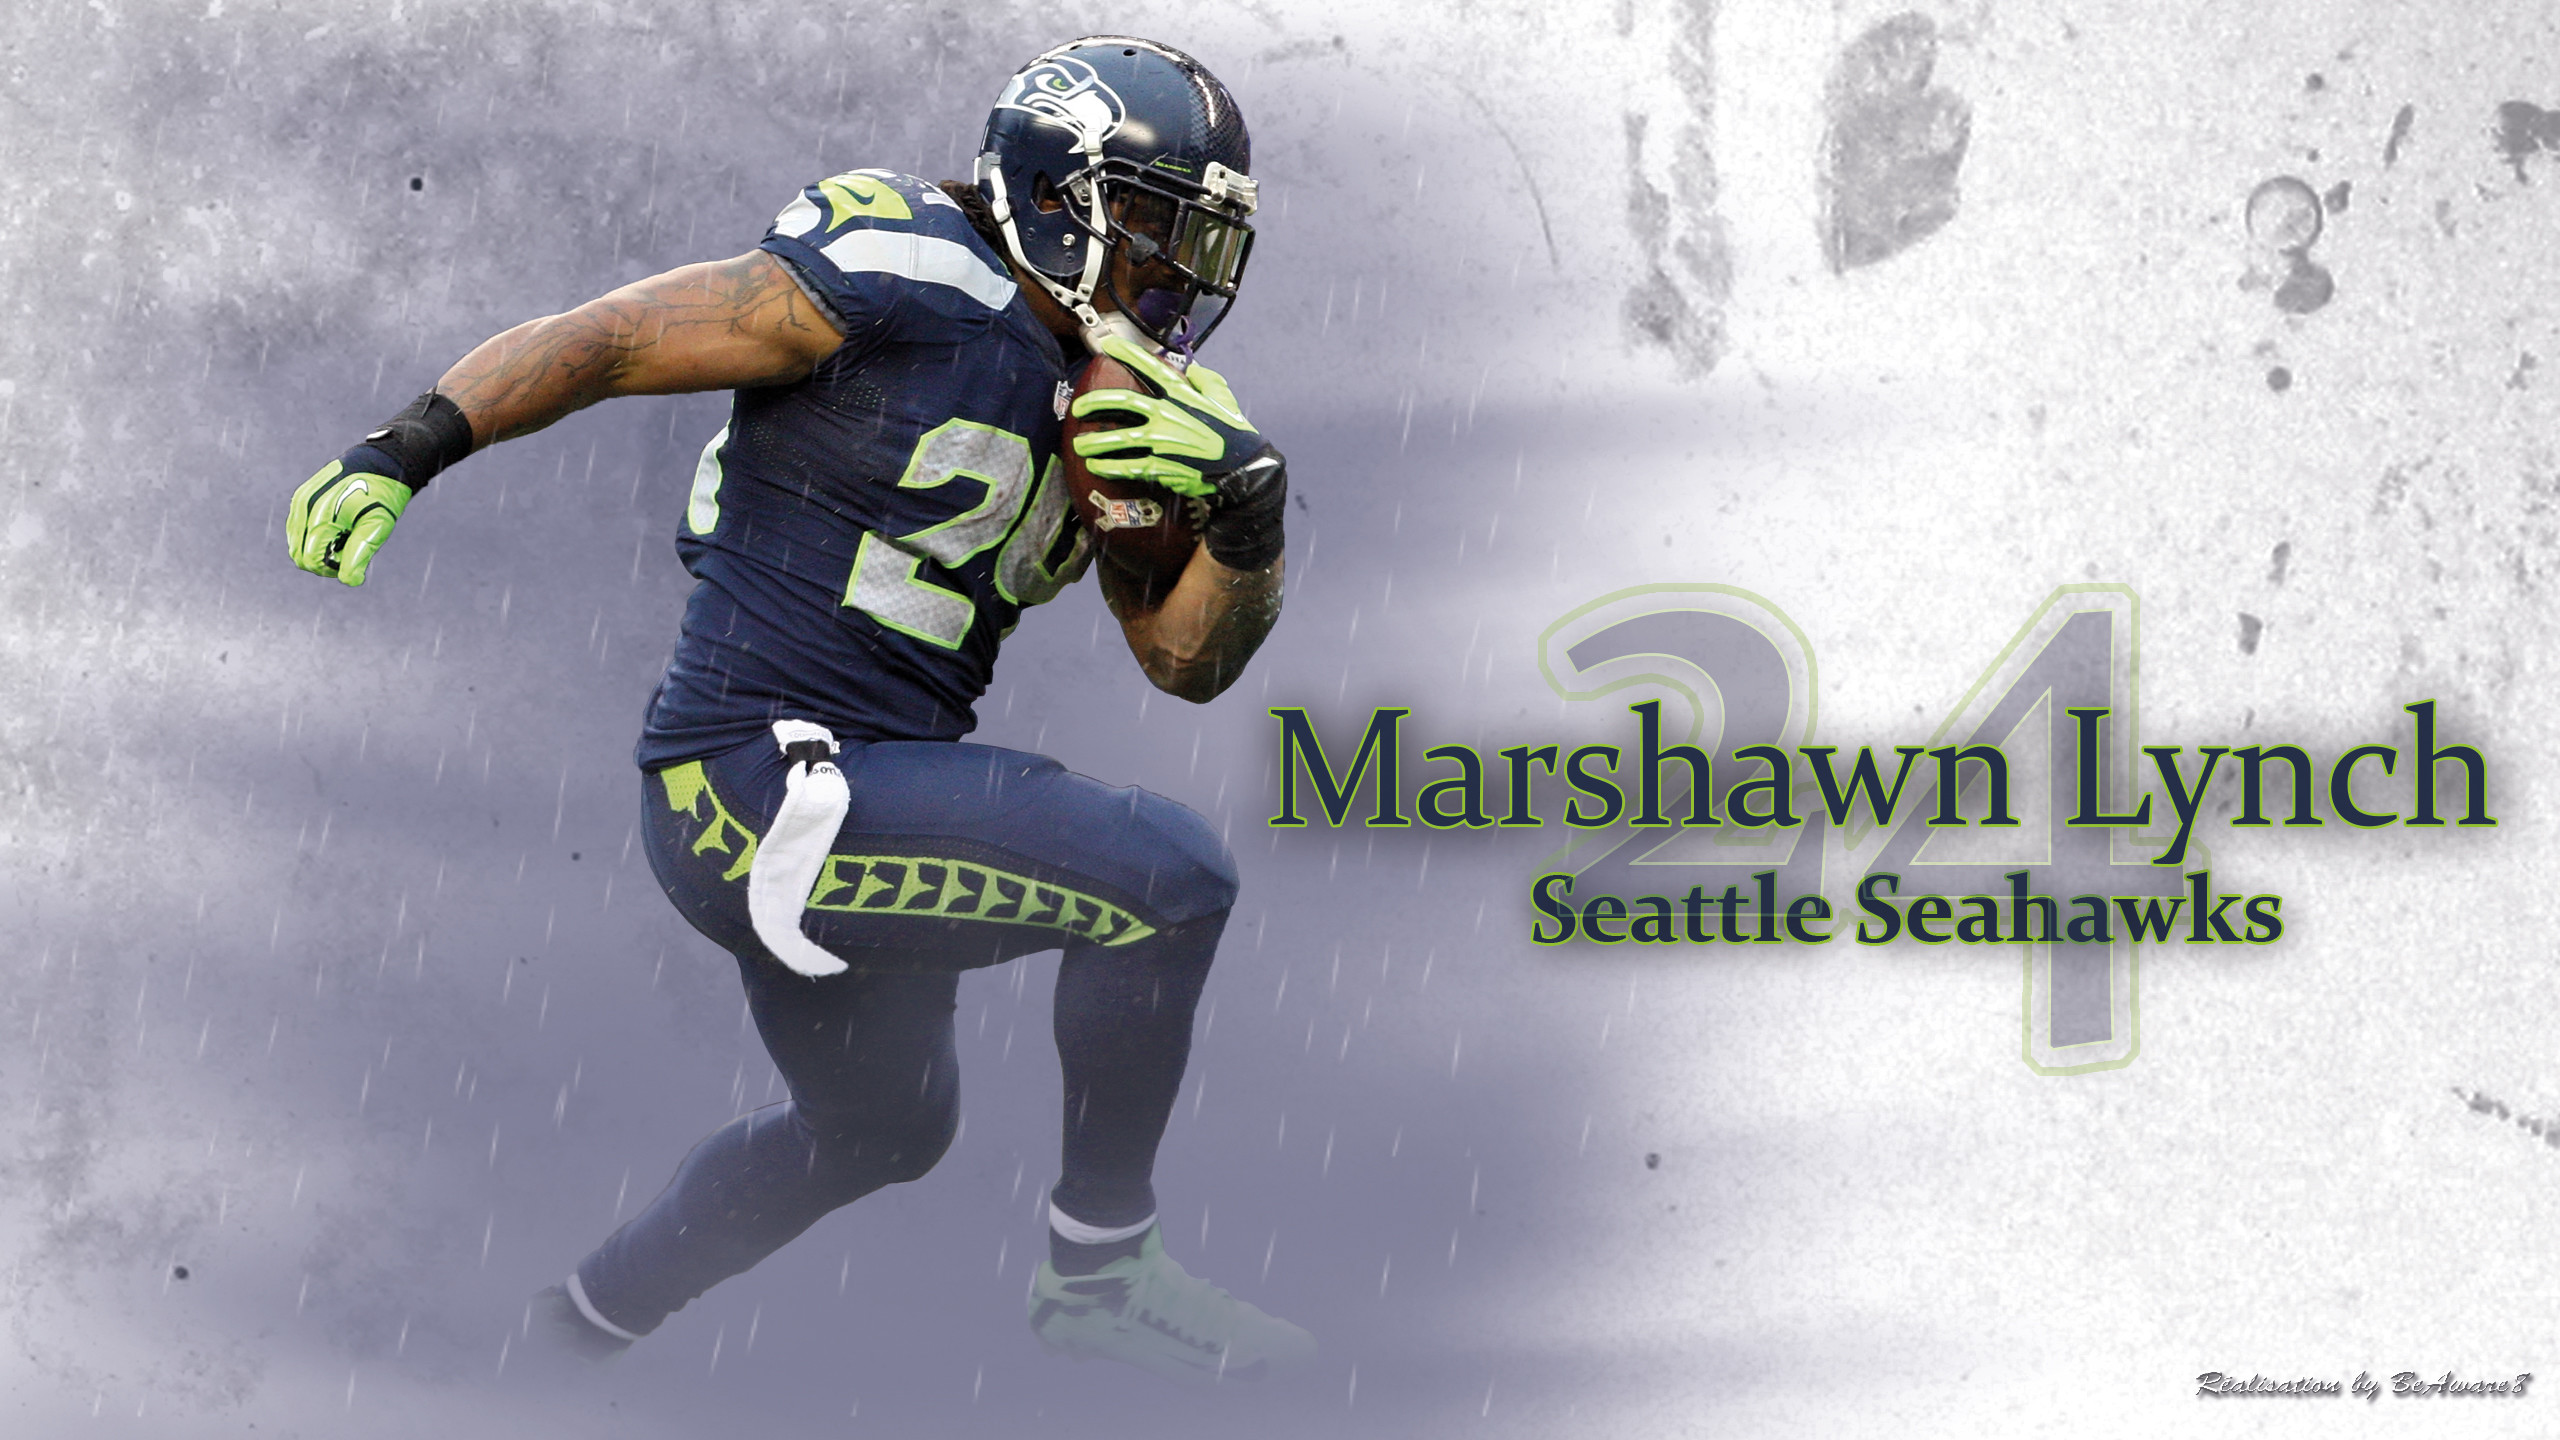 Seahawks Marshawn Lynch Wallpaper free desktop backgrounds and .